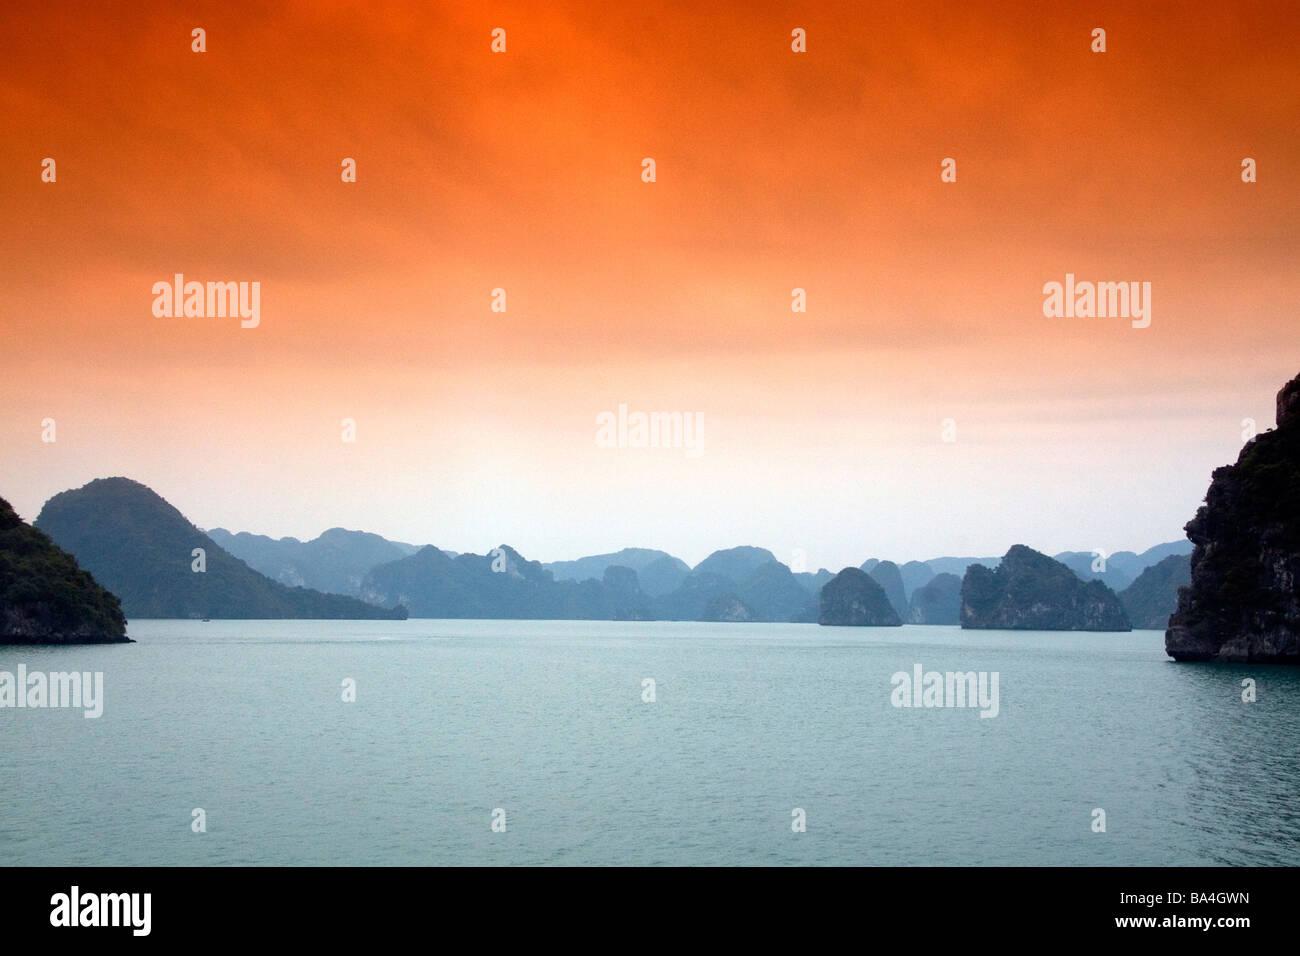 Foschia mattutina vedute della Baia di Ha Long Vietnam Immagini Stock